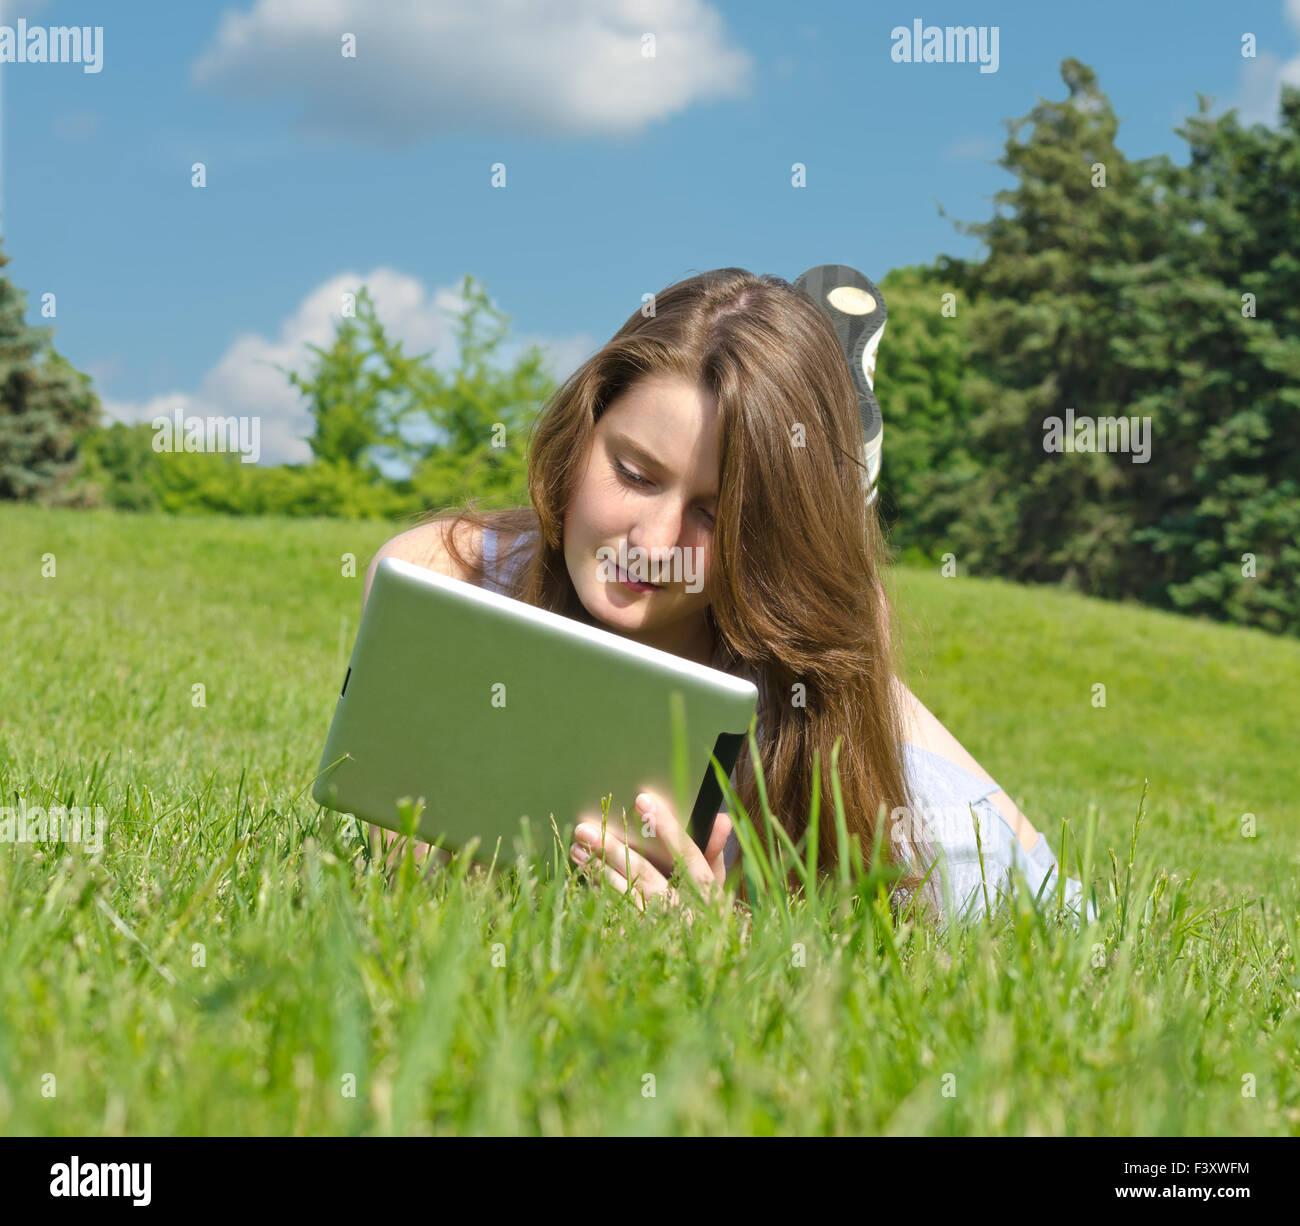 Mujer joven con touchpad Imagen De Stock